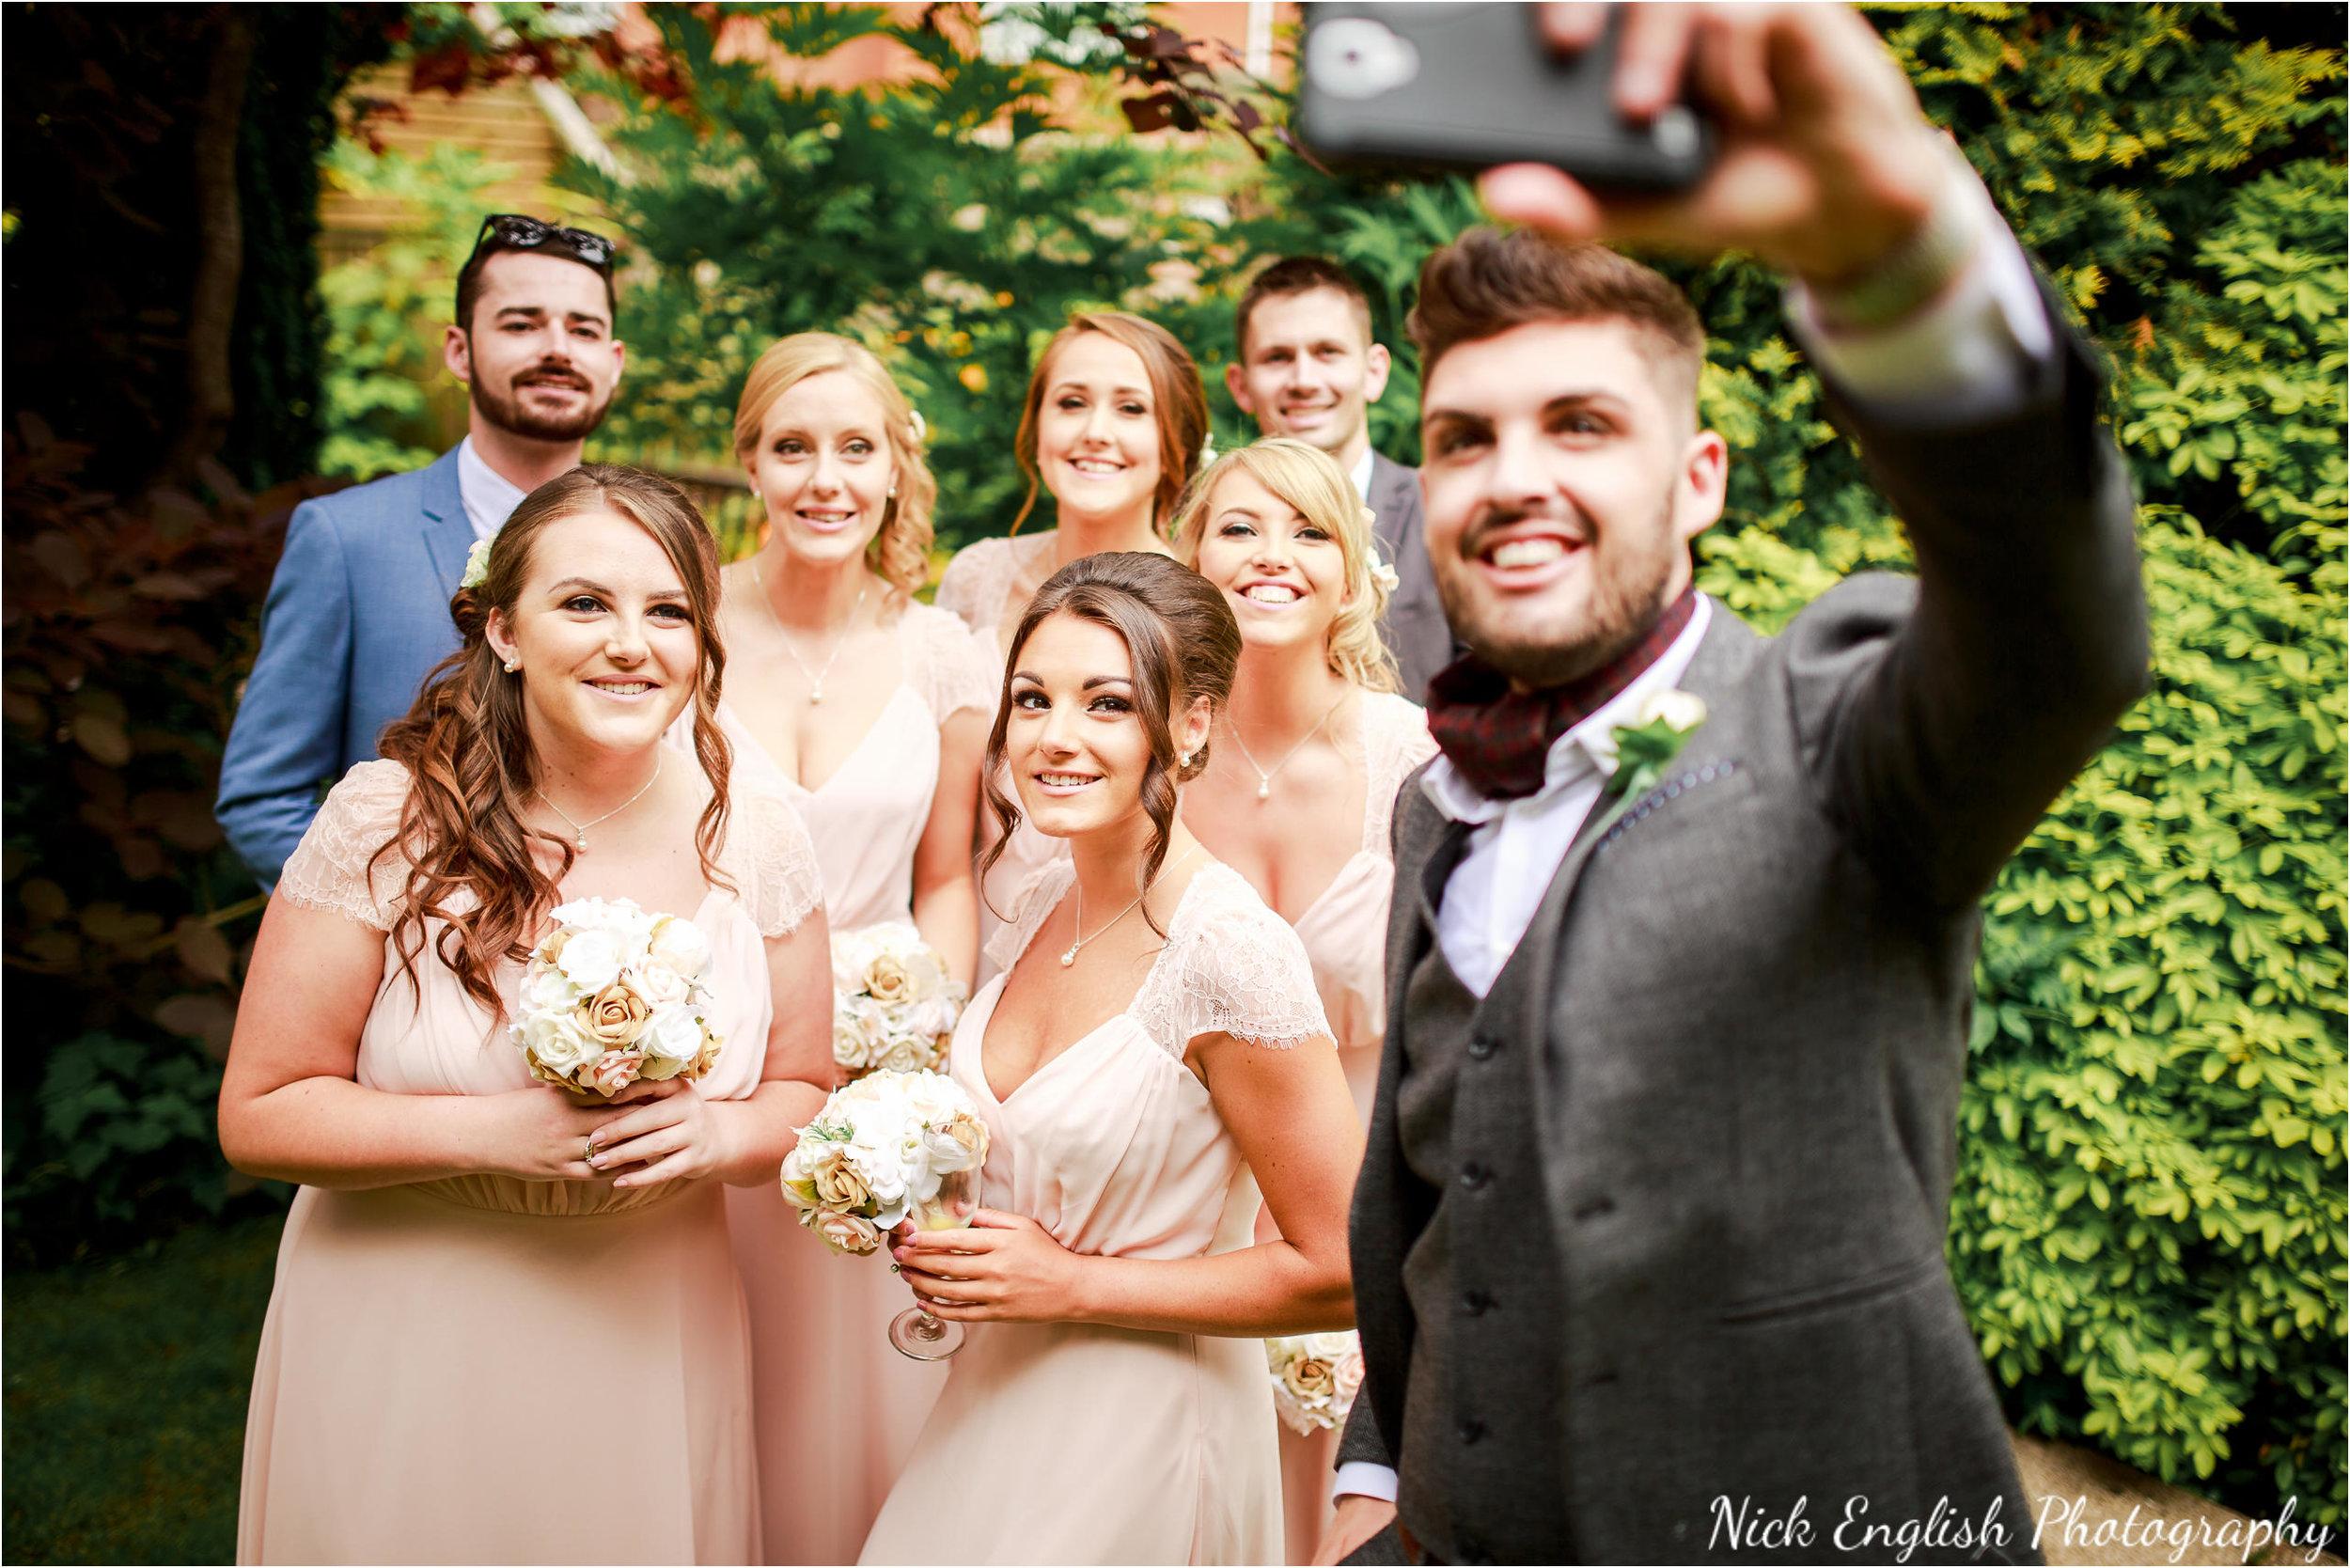 Emily David Wedding Photographs at Barton Grange Preston by Nick English Photography 134jpg.jpeg